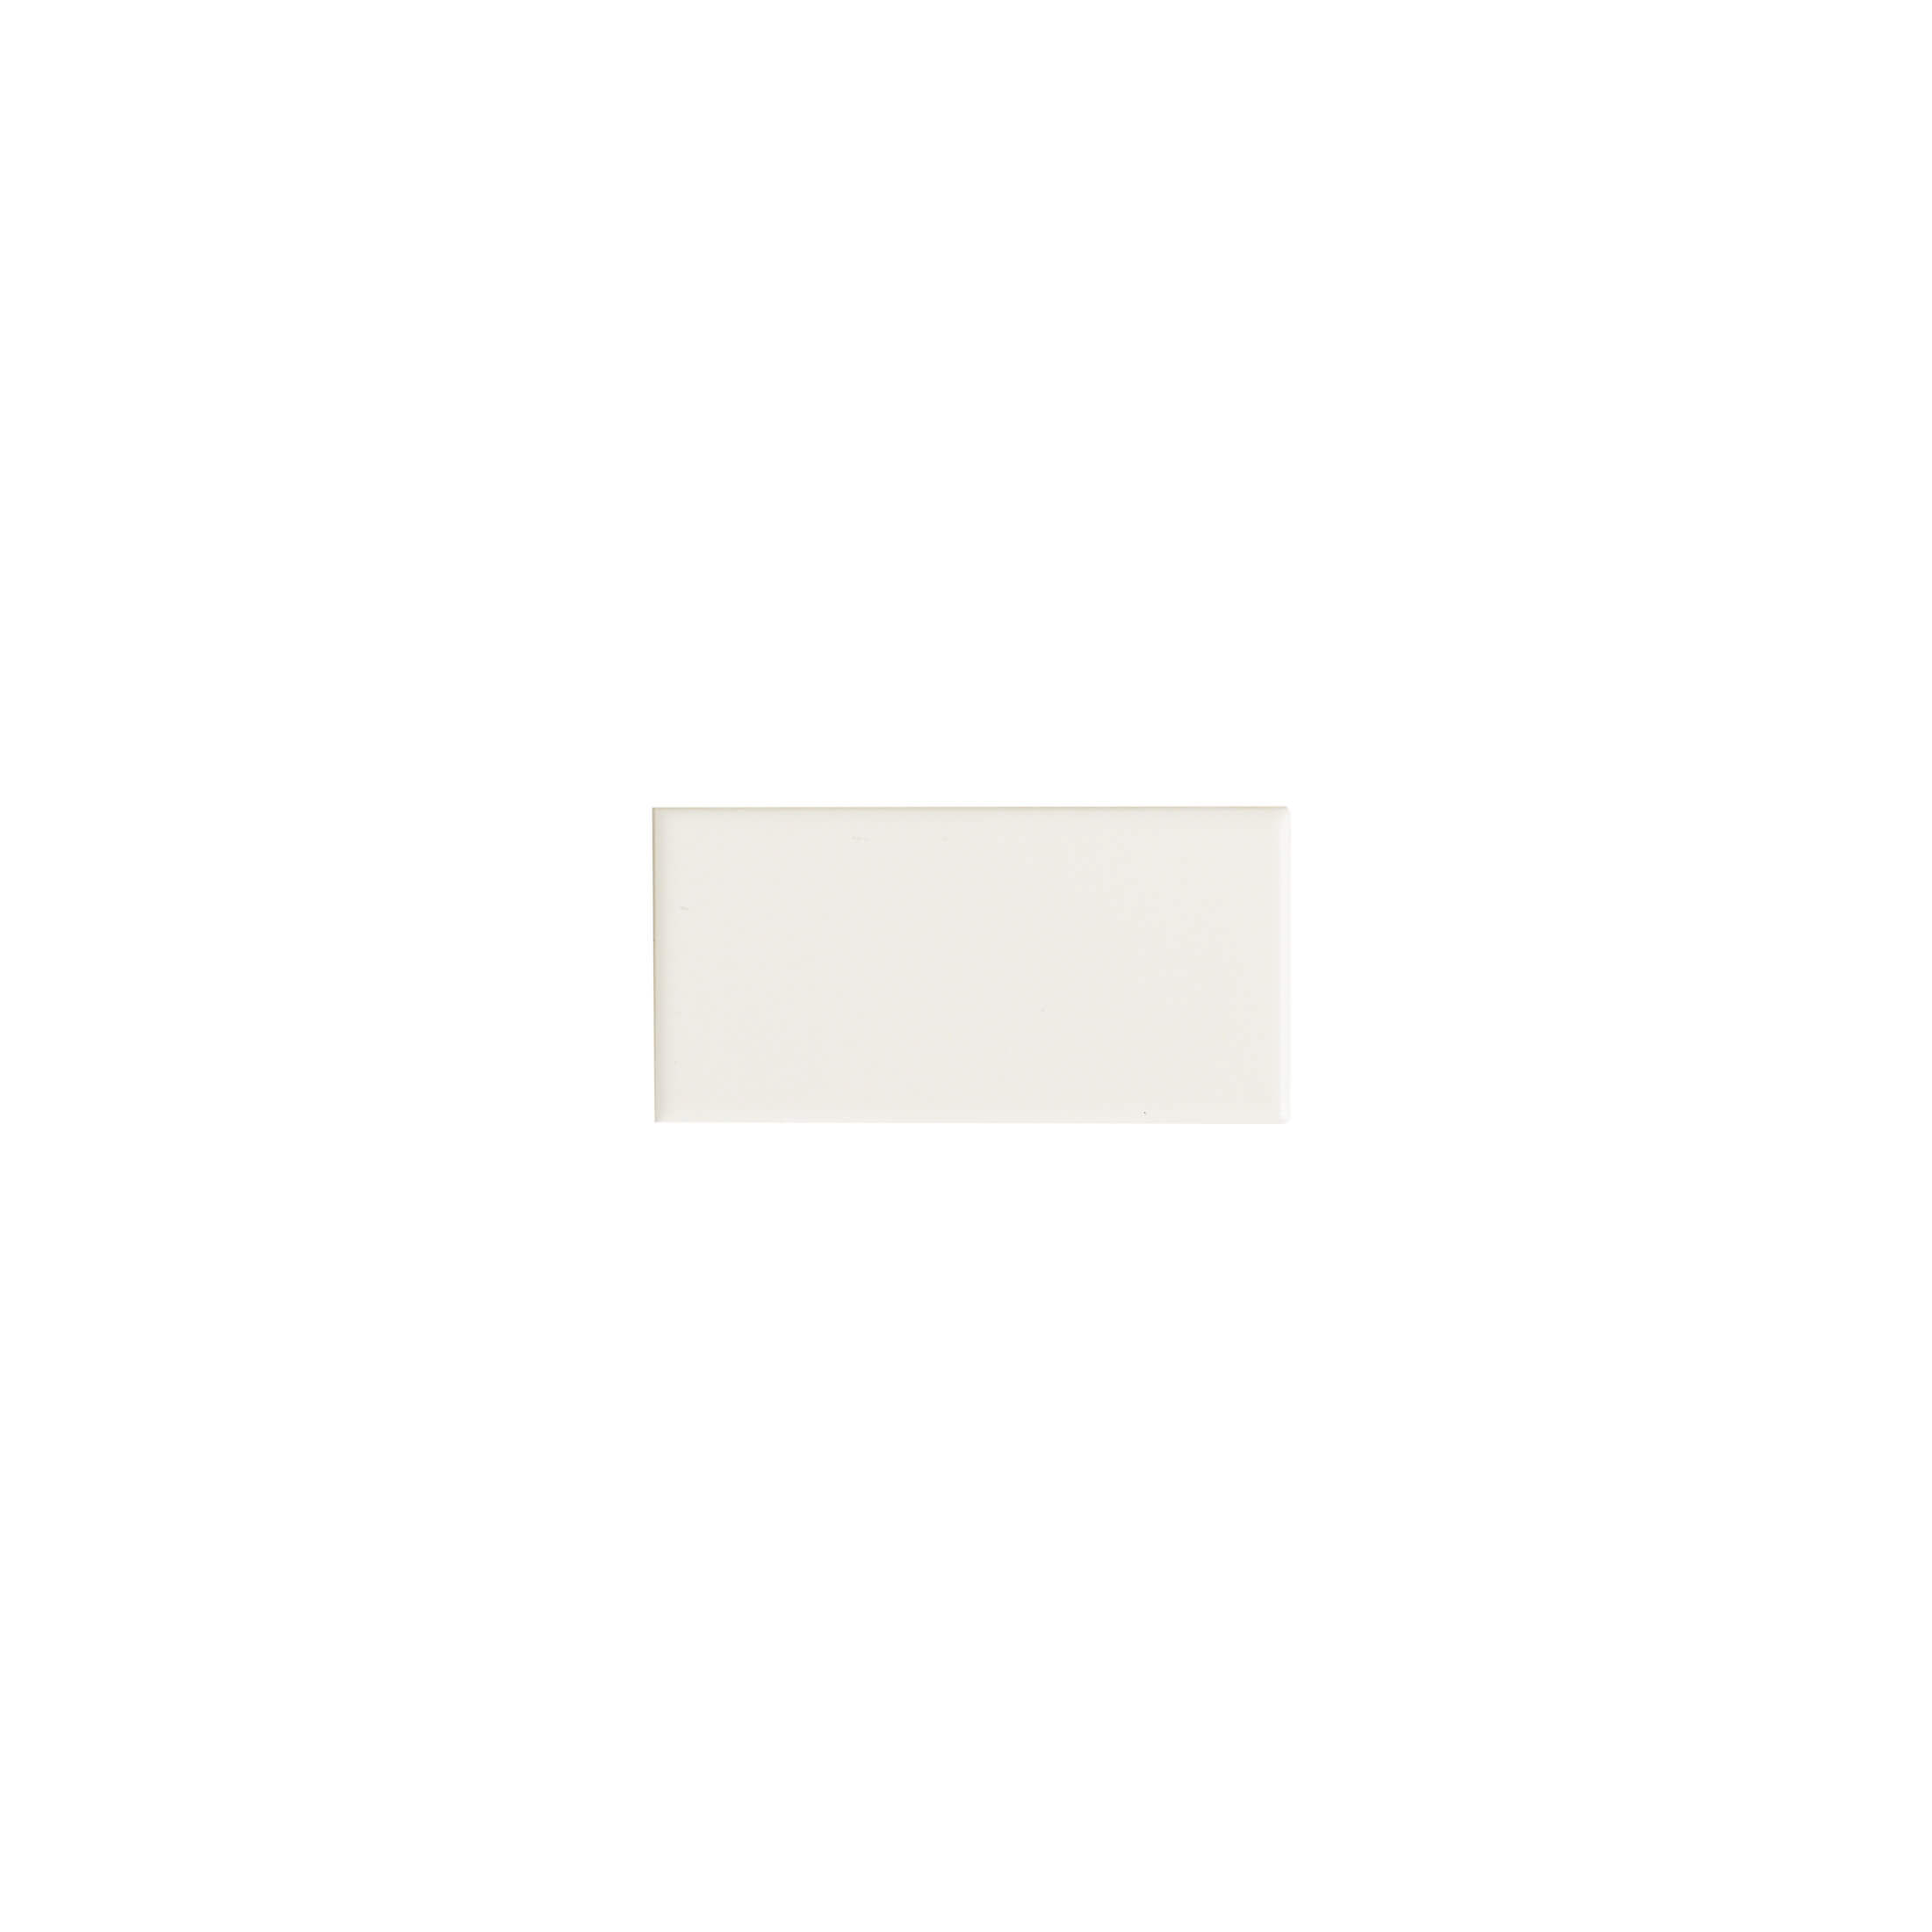 ADNE1047 - LISO PB - 5 cm X 10 cm